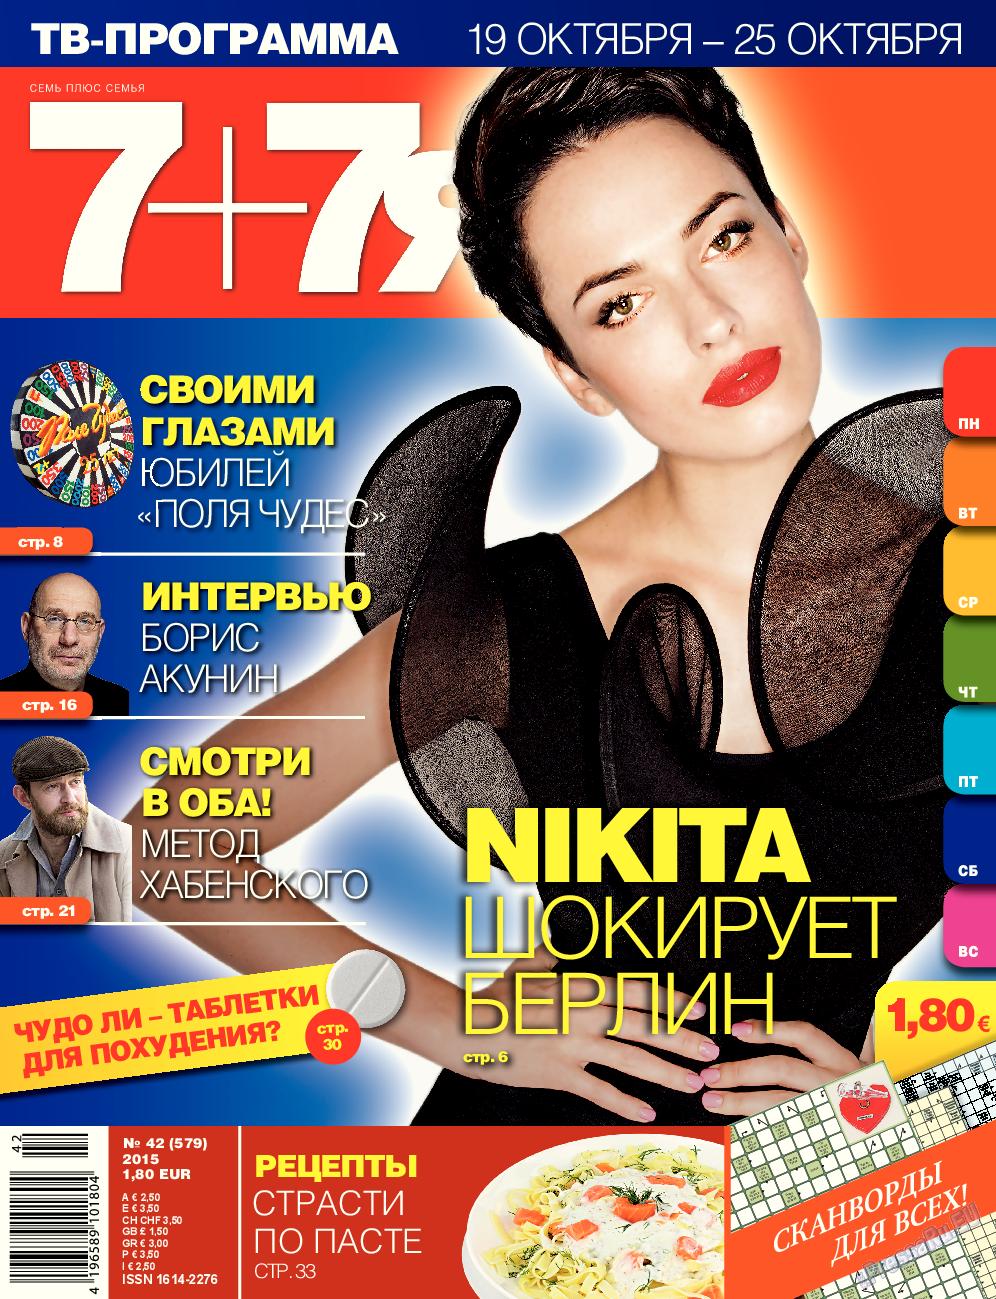 7плюс7я (журнал). 2015 год, номер 42, стр. 1